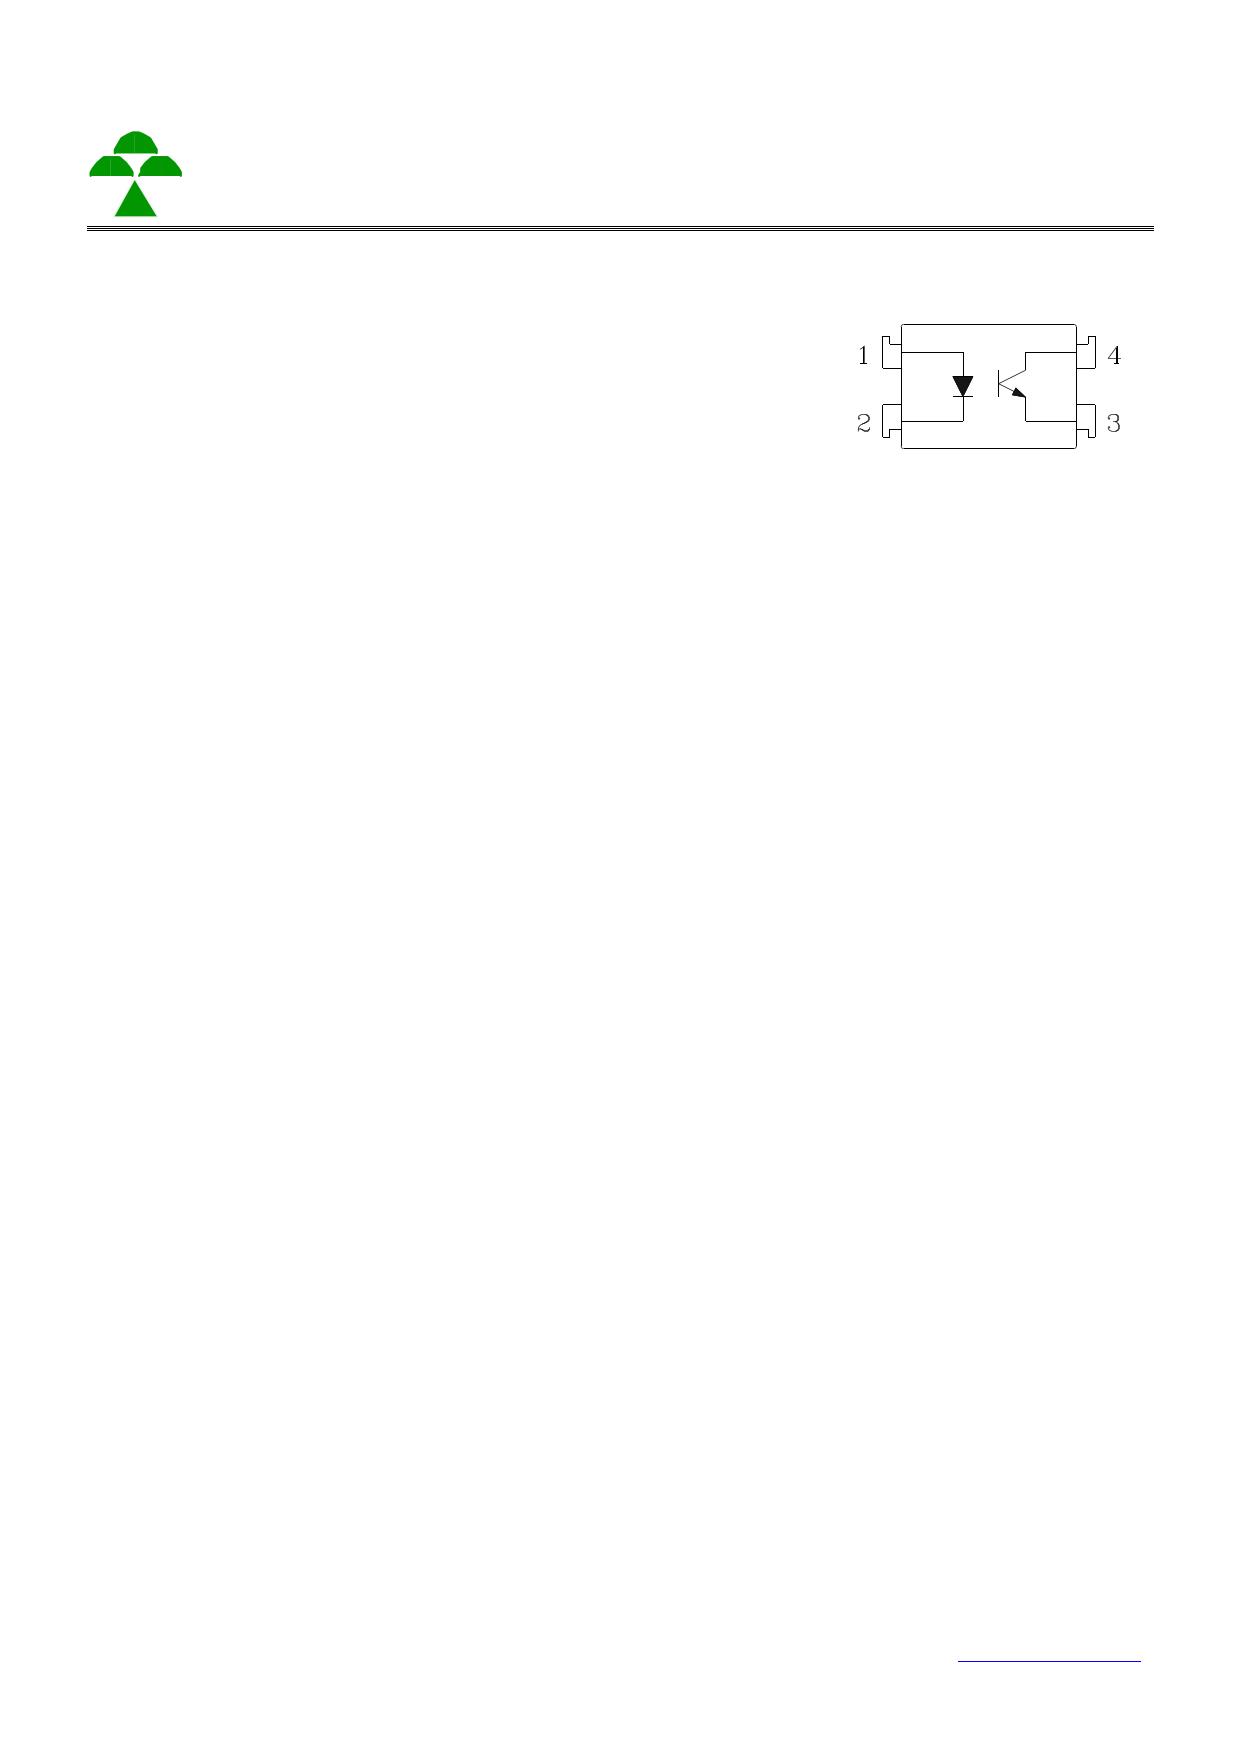 K10106X Даташит, Описание, Даташиты